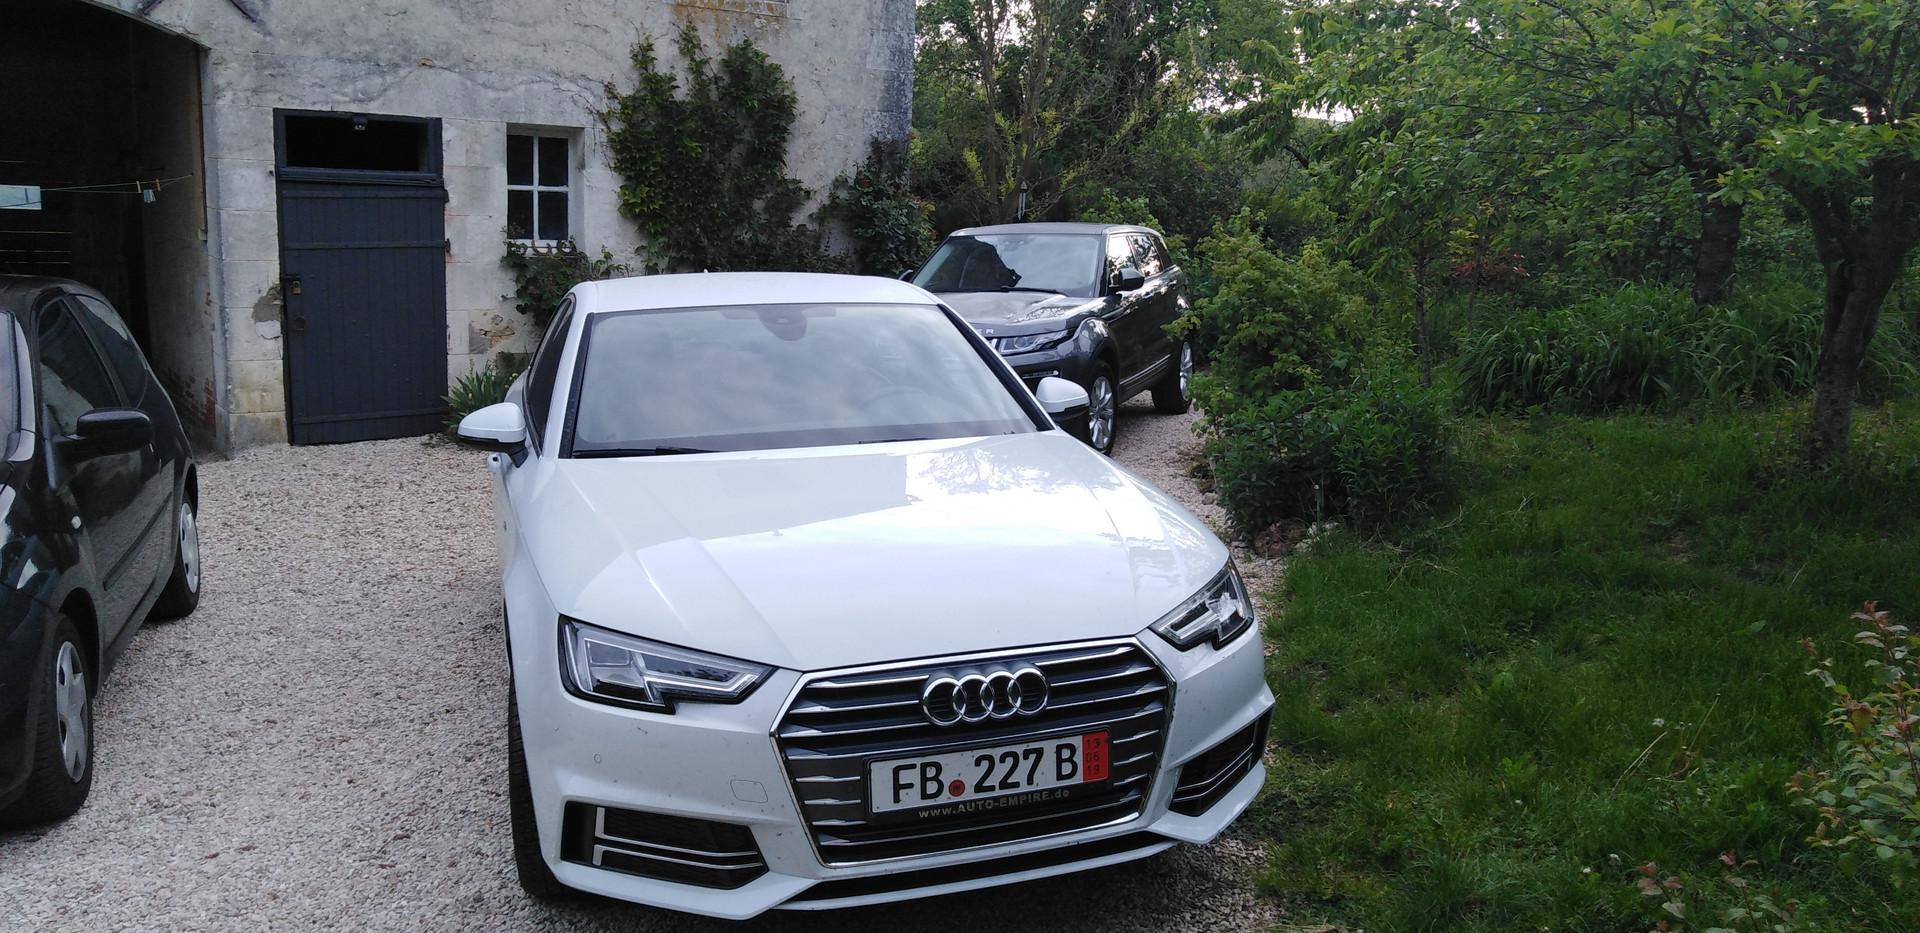 Audi A4.jpg